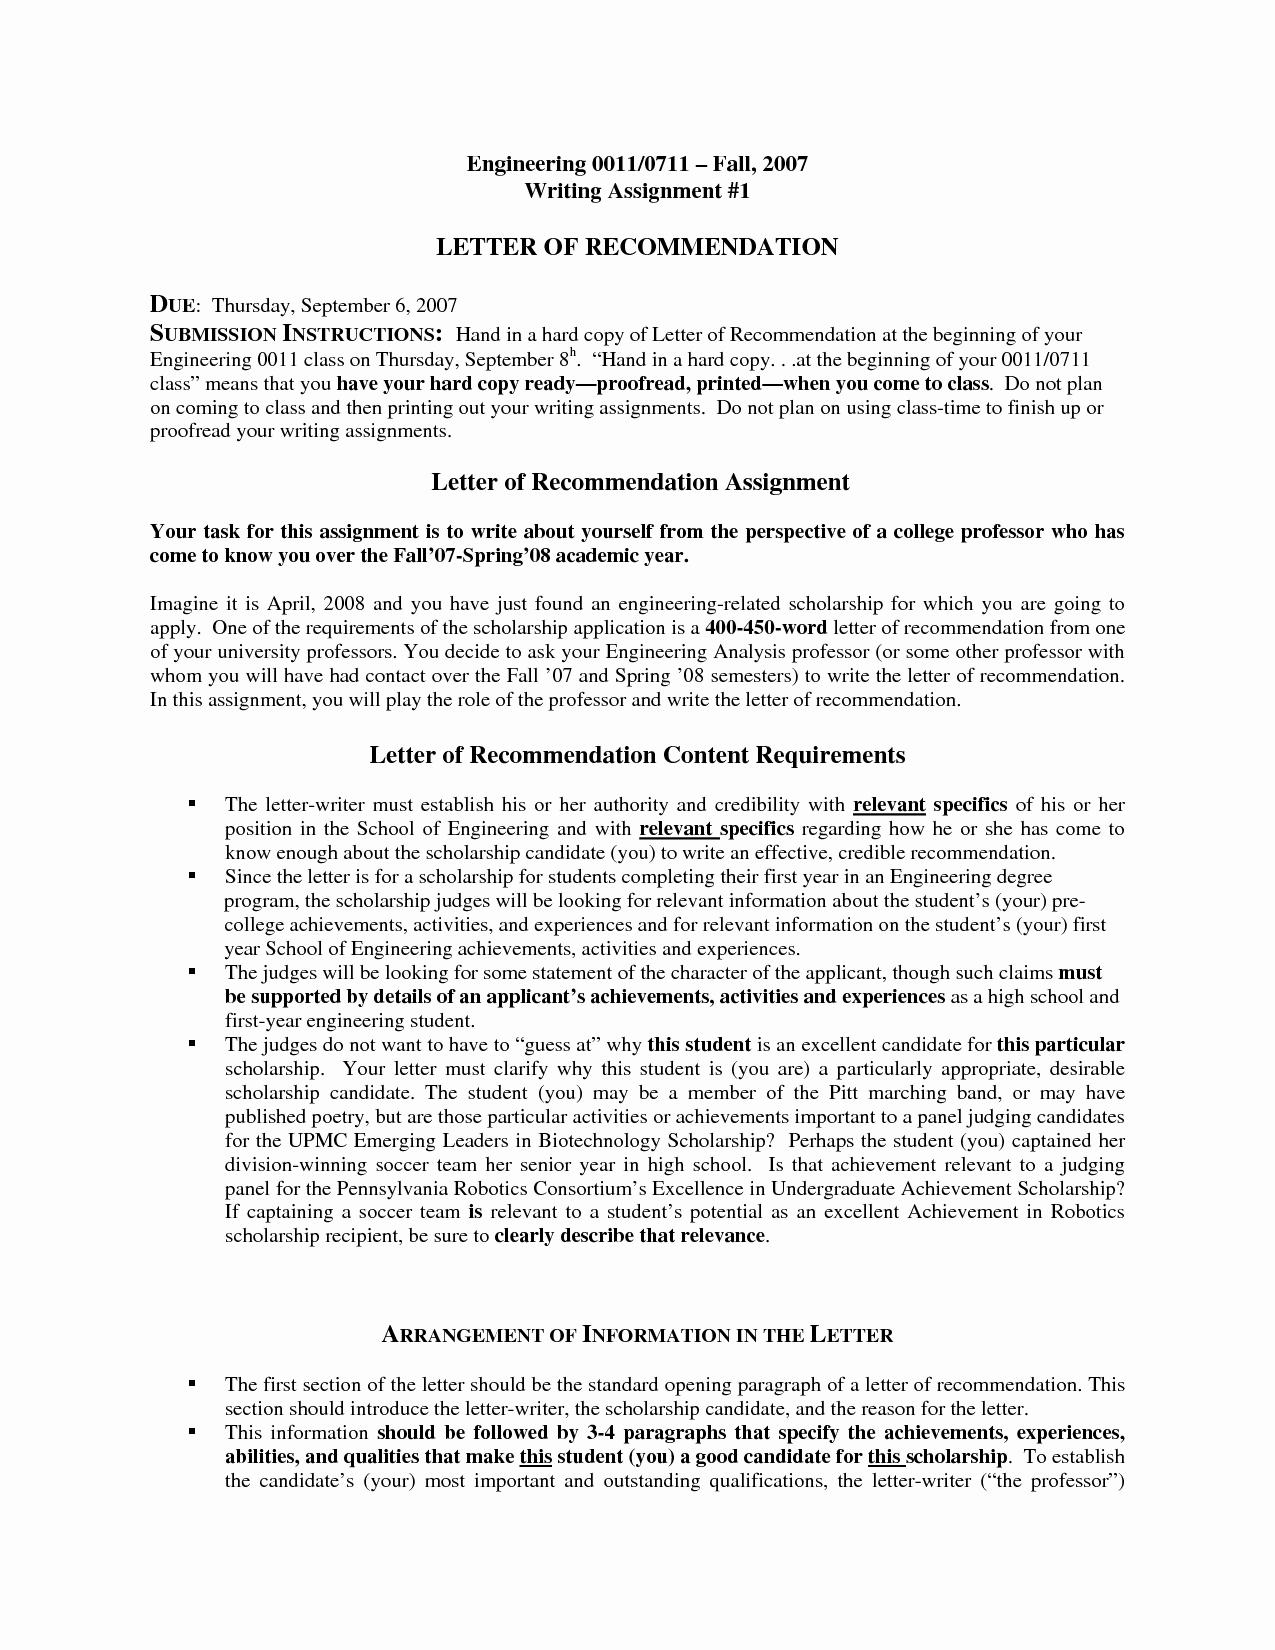 Free Sample Letter Re Mendation